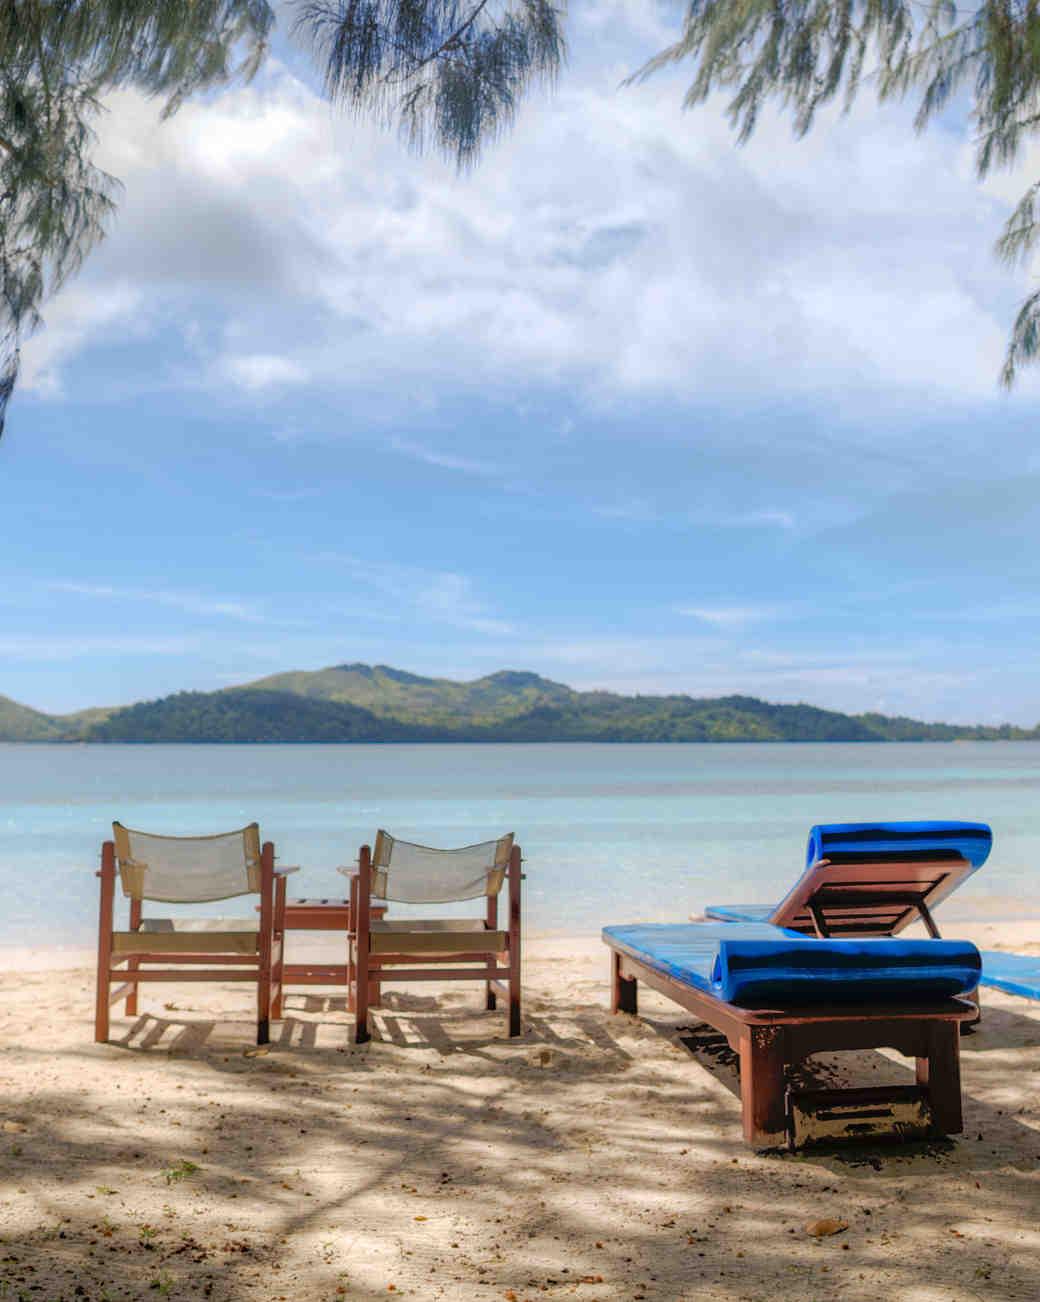 private-islands-turtle-island-lagoon-beach-1015.jpg